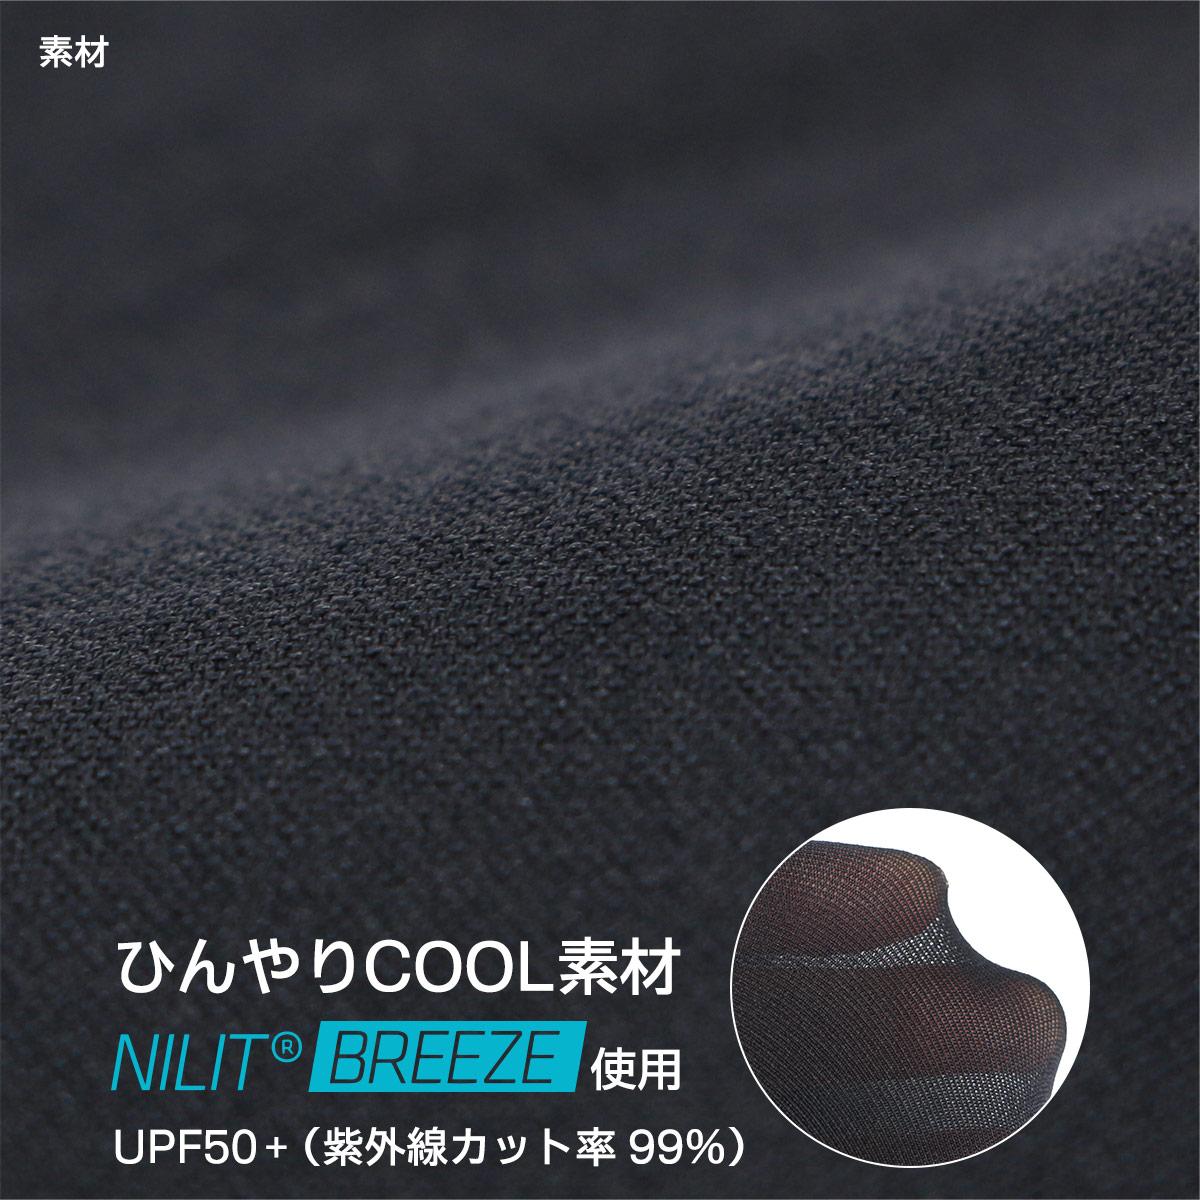 NAIGAI COMFORT ナイガイ コンフォート レディース UV加工 ひんやりCOOL素材 レギンス 8分丈 1007001【ゆうパケット・2点まで】